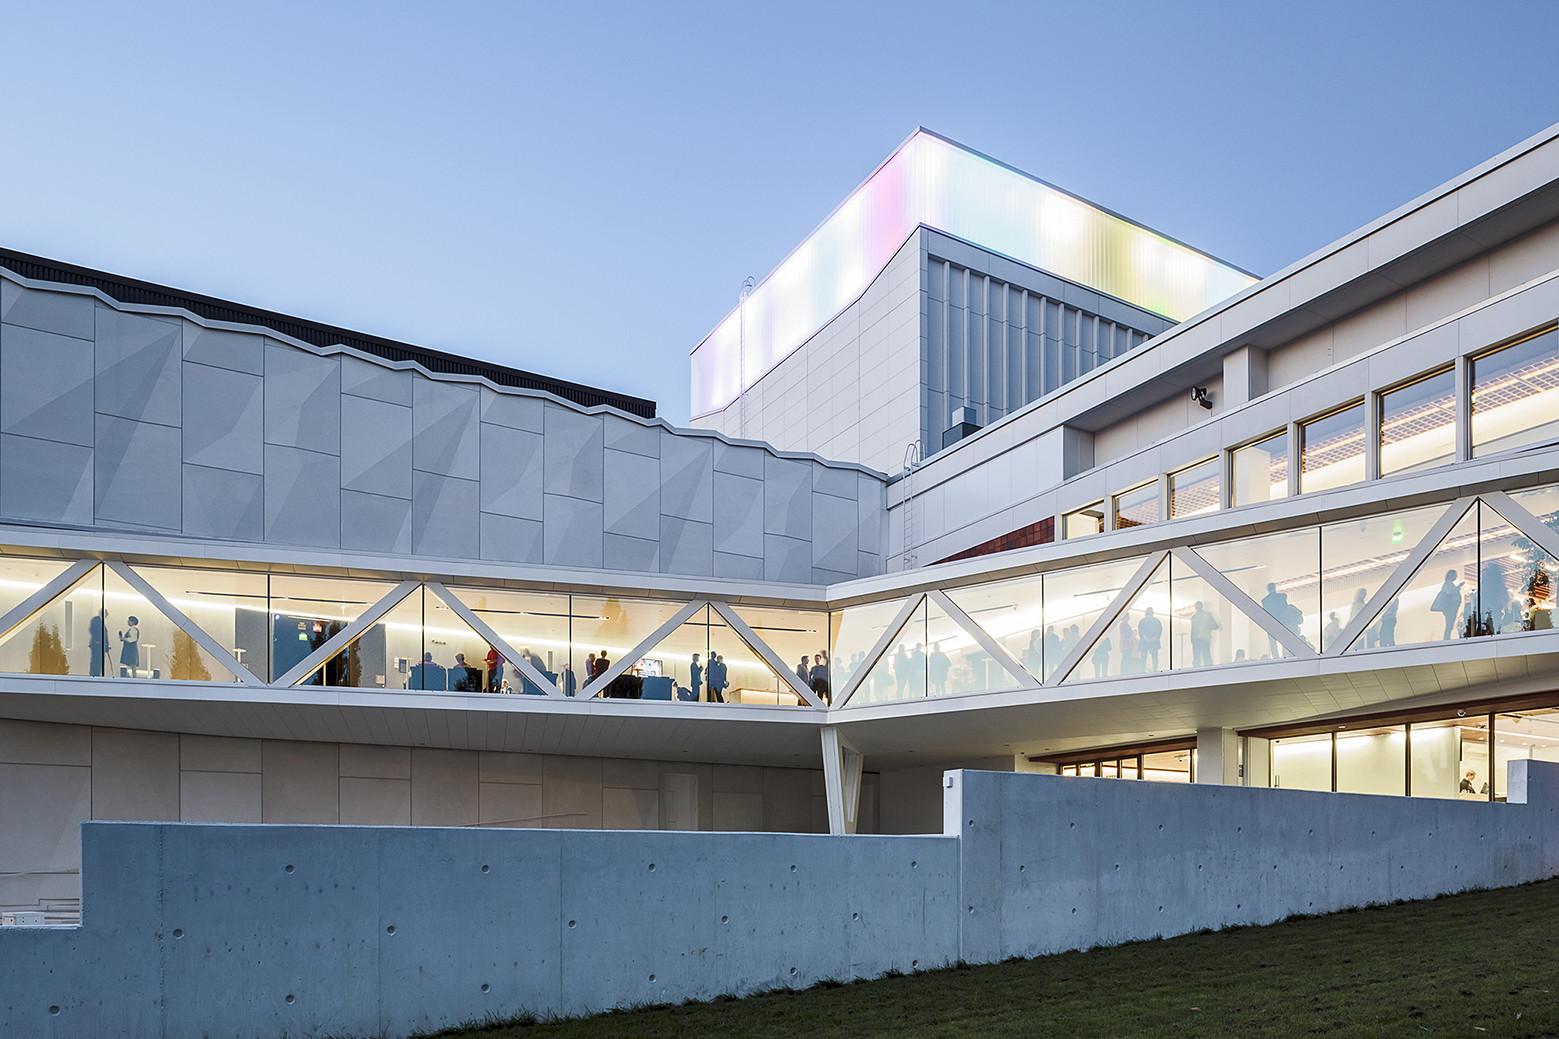 Teatro de Kuopio / ALA Architects, © Tuomas Uusheimo